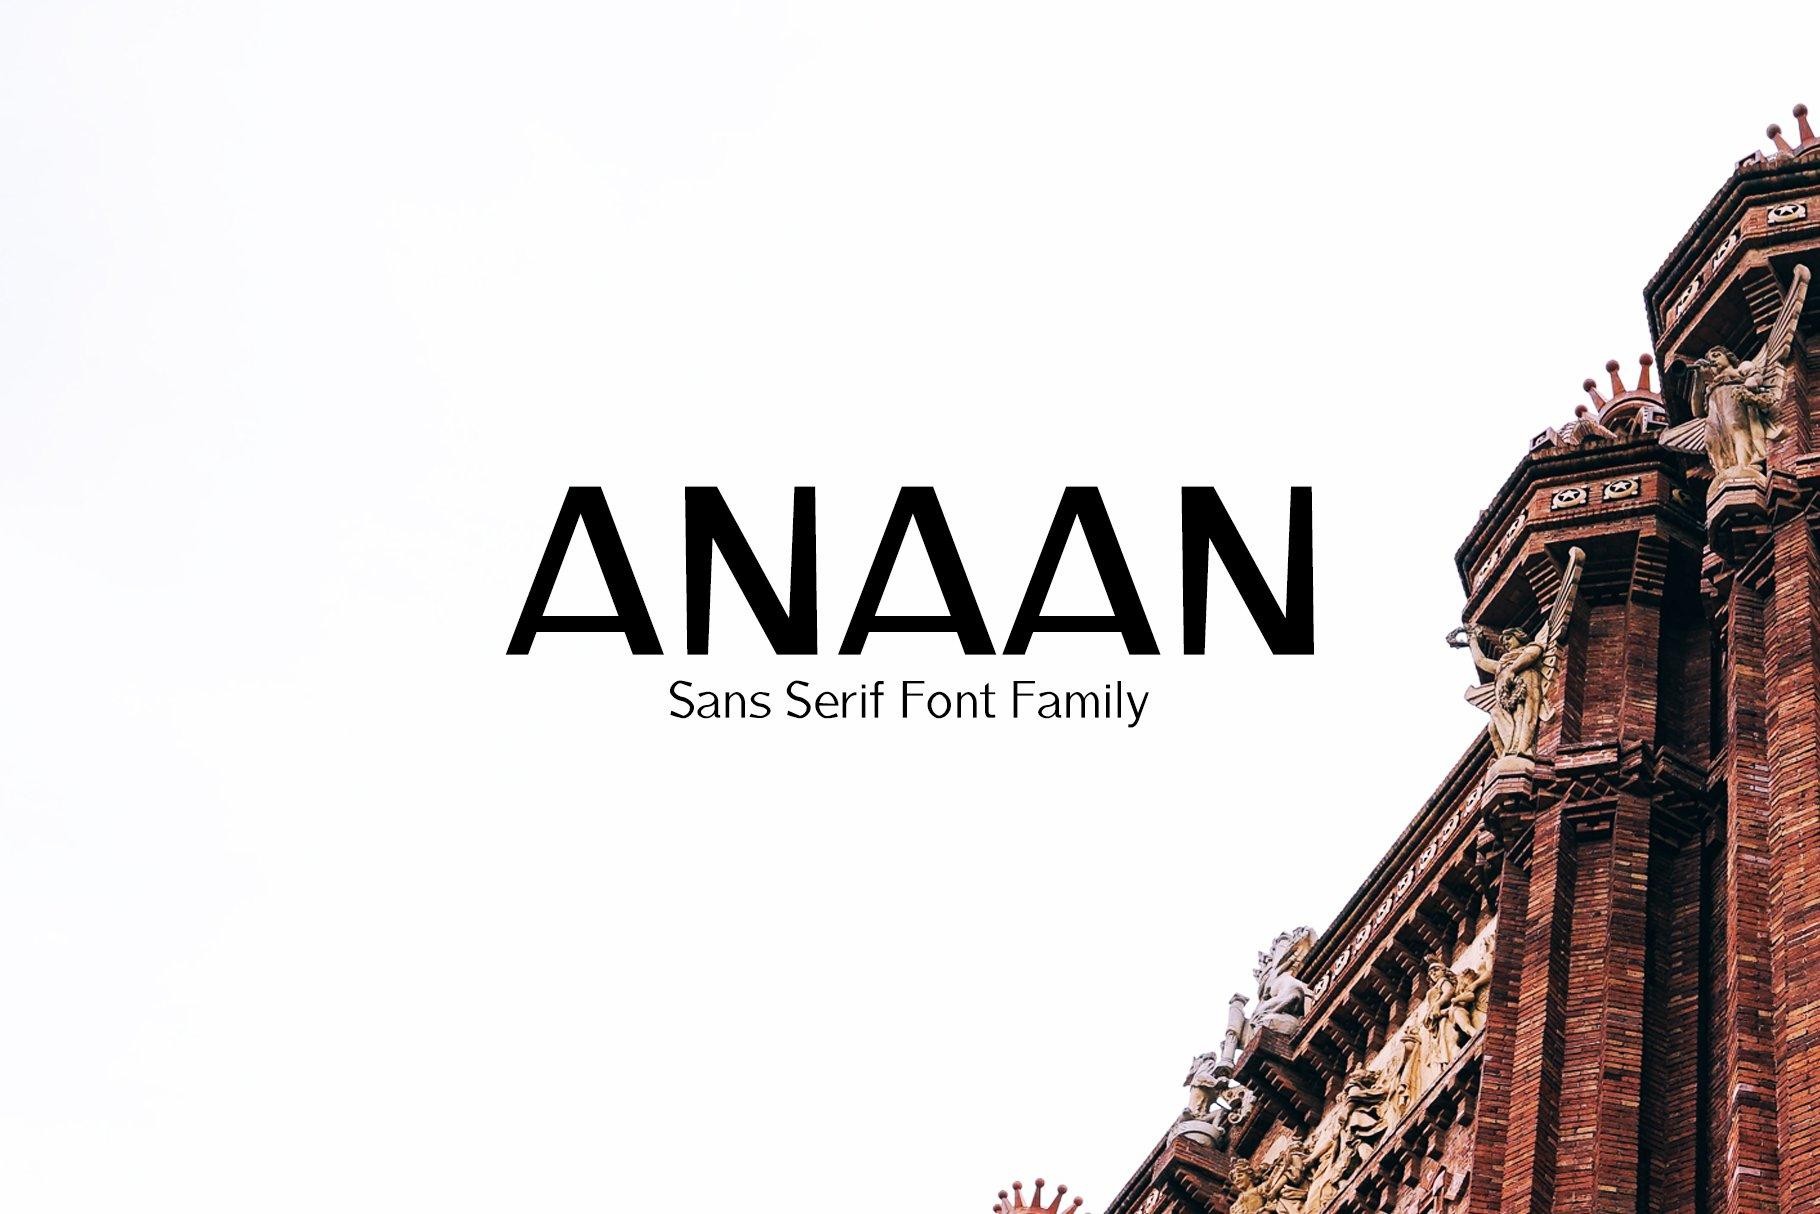 Anaan Sans Serif Font Family ~ Sans Serif Fonts ~ Creative